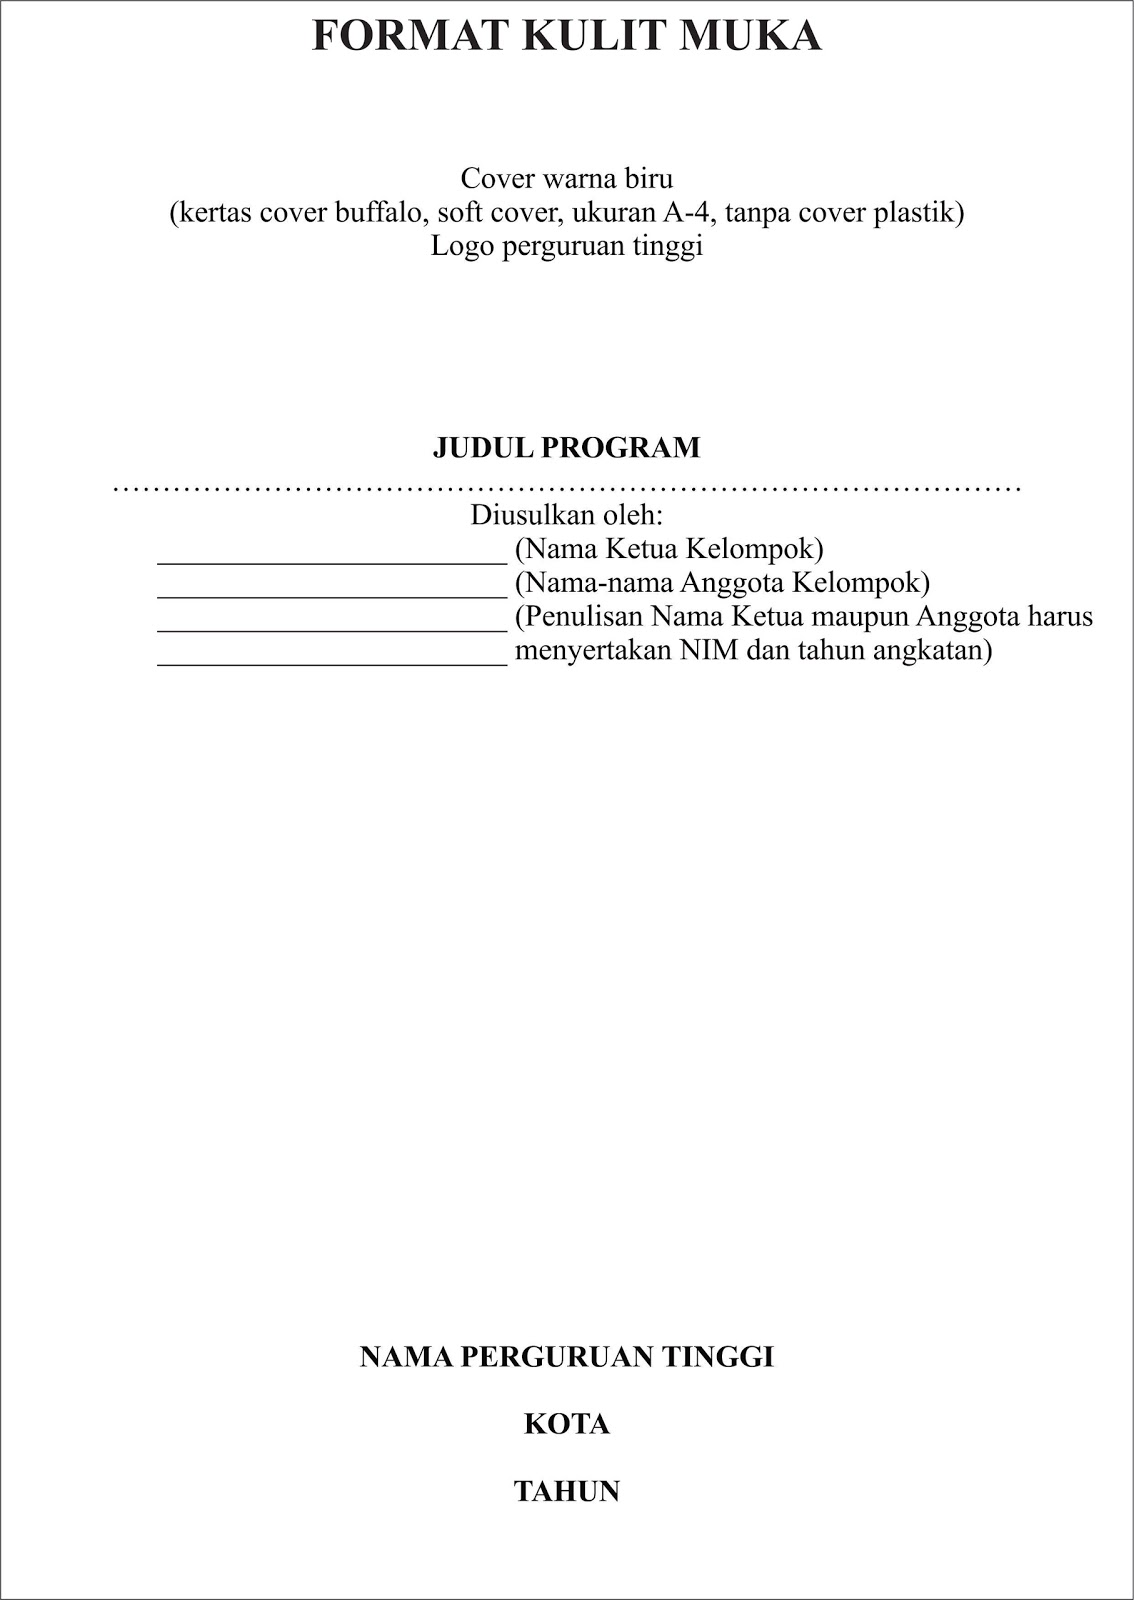 Contoh Makalah Karya Tulis | Share The Knownledge